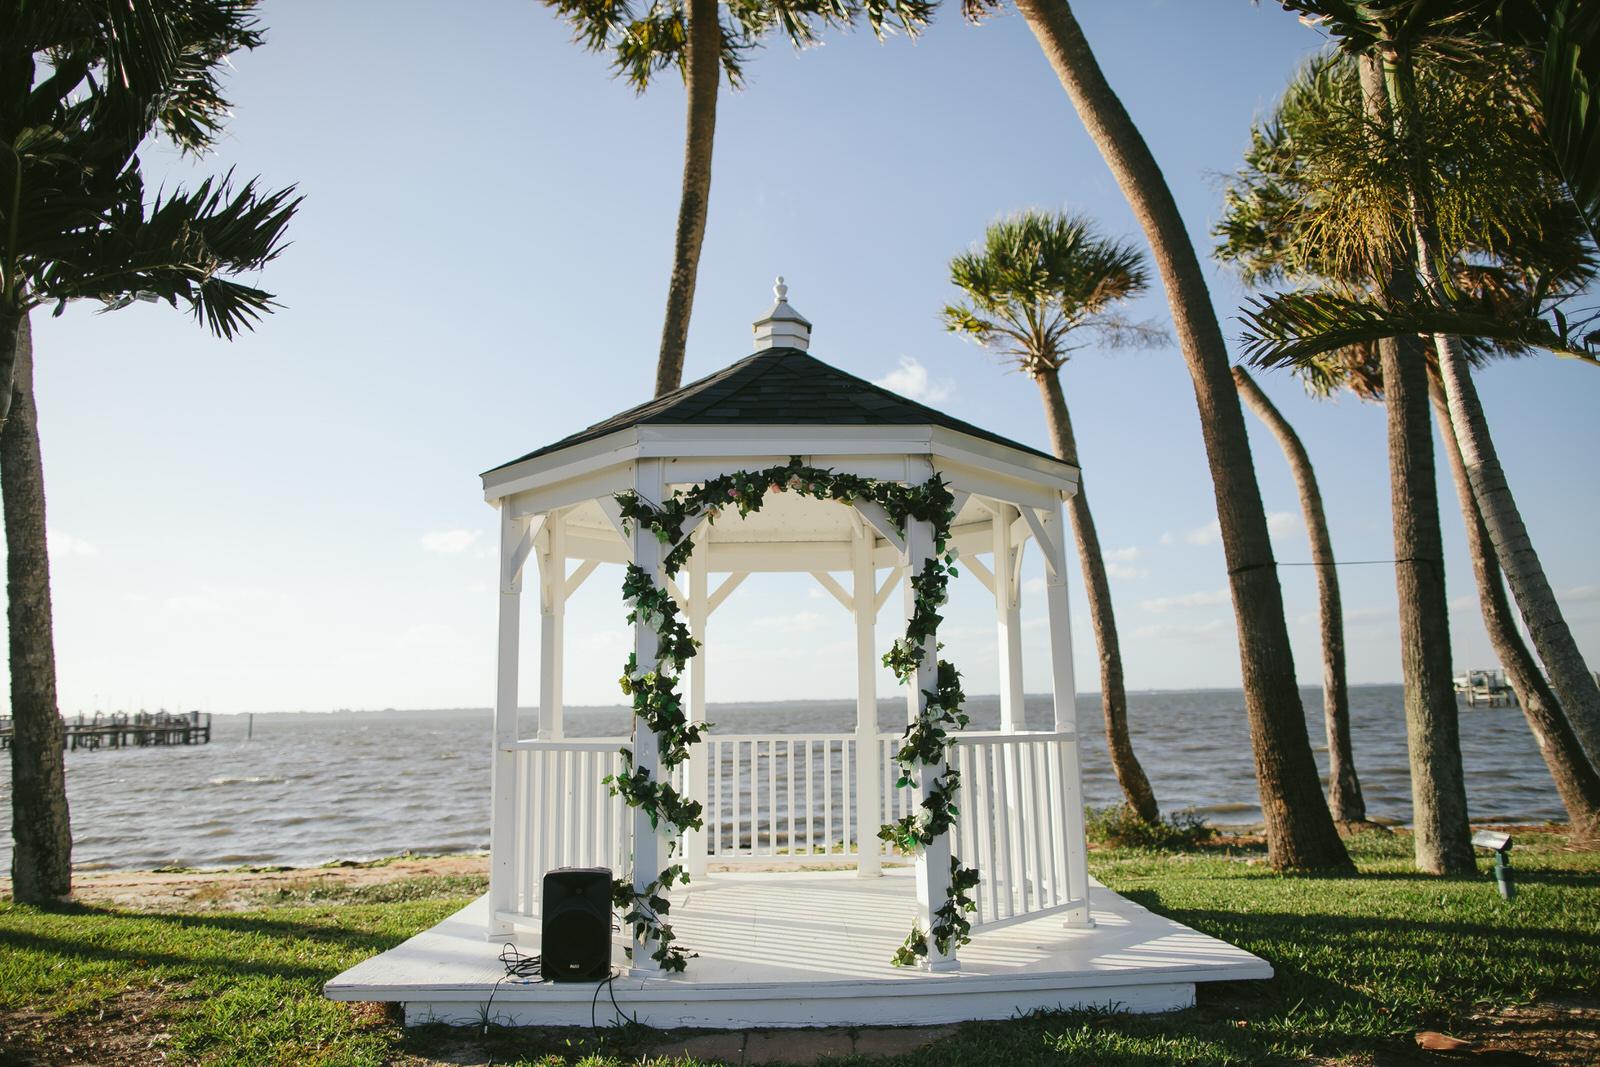 jensen_beach_wedding_ceremony-14.jpg